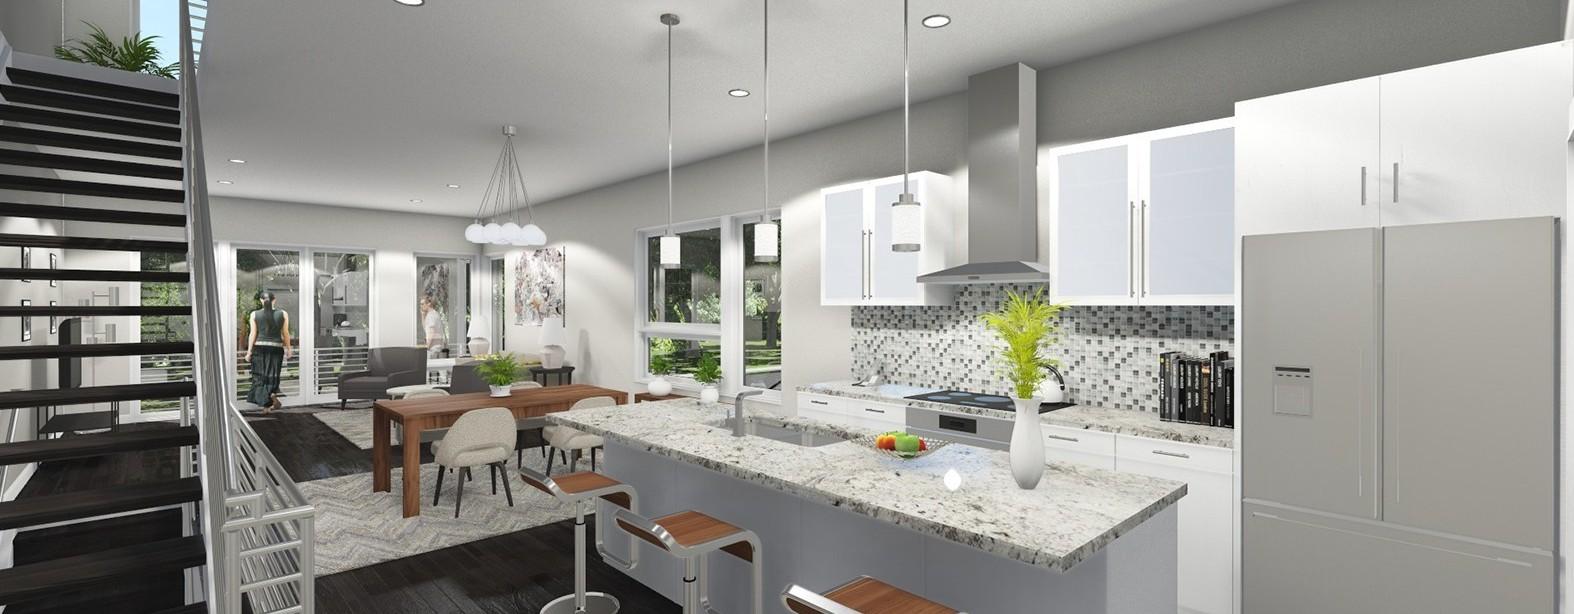 Luxity Terraces Kitchen